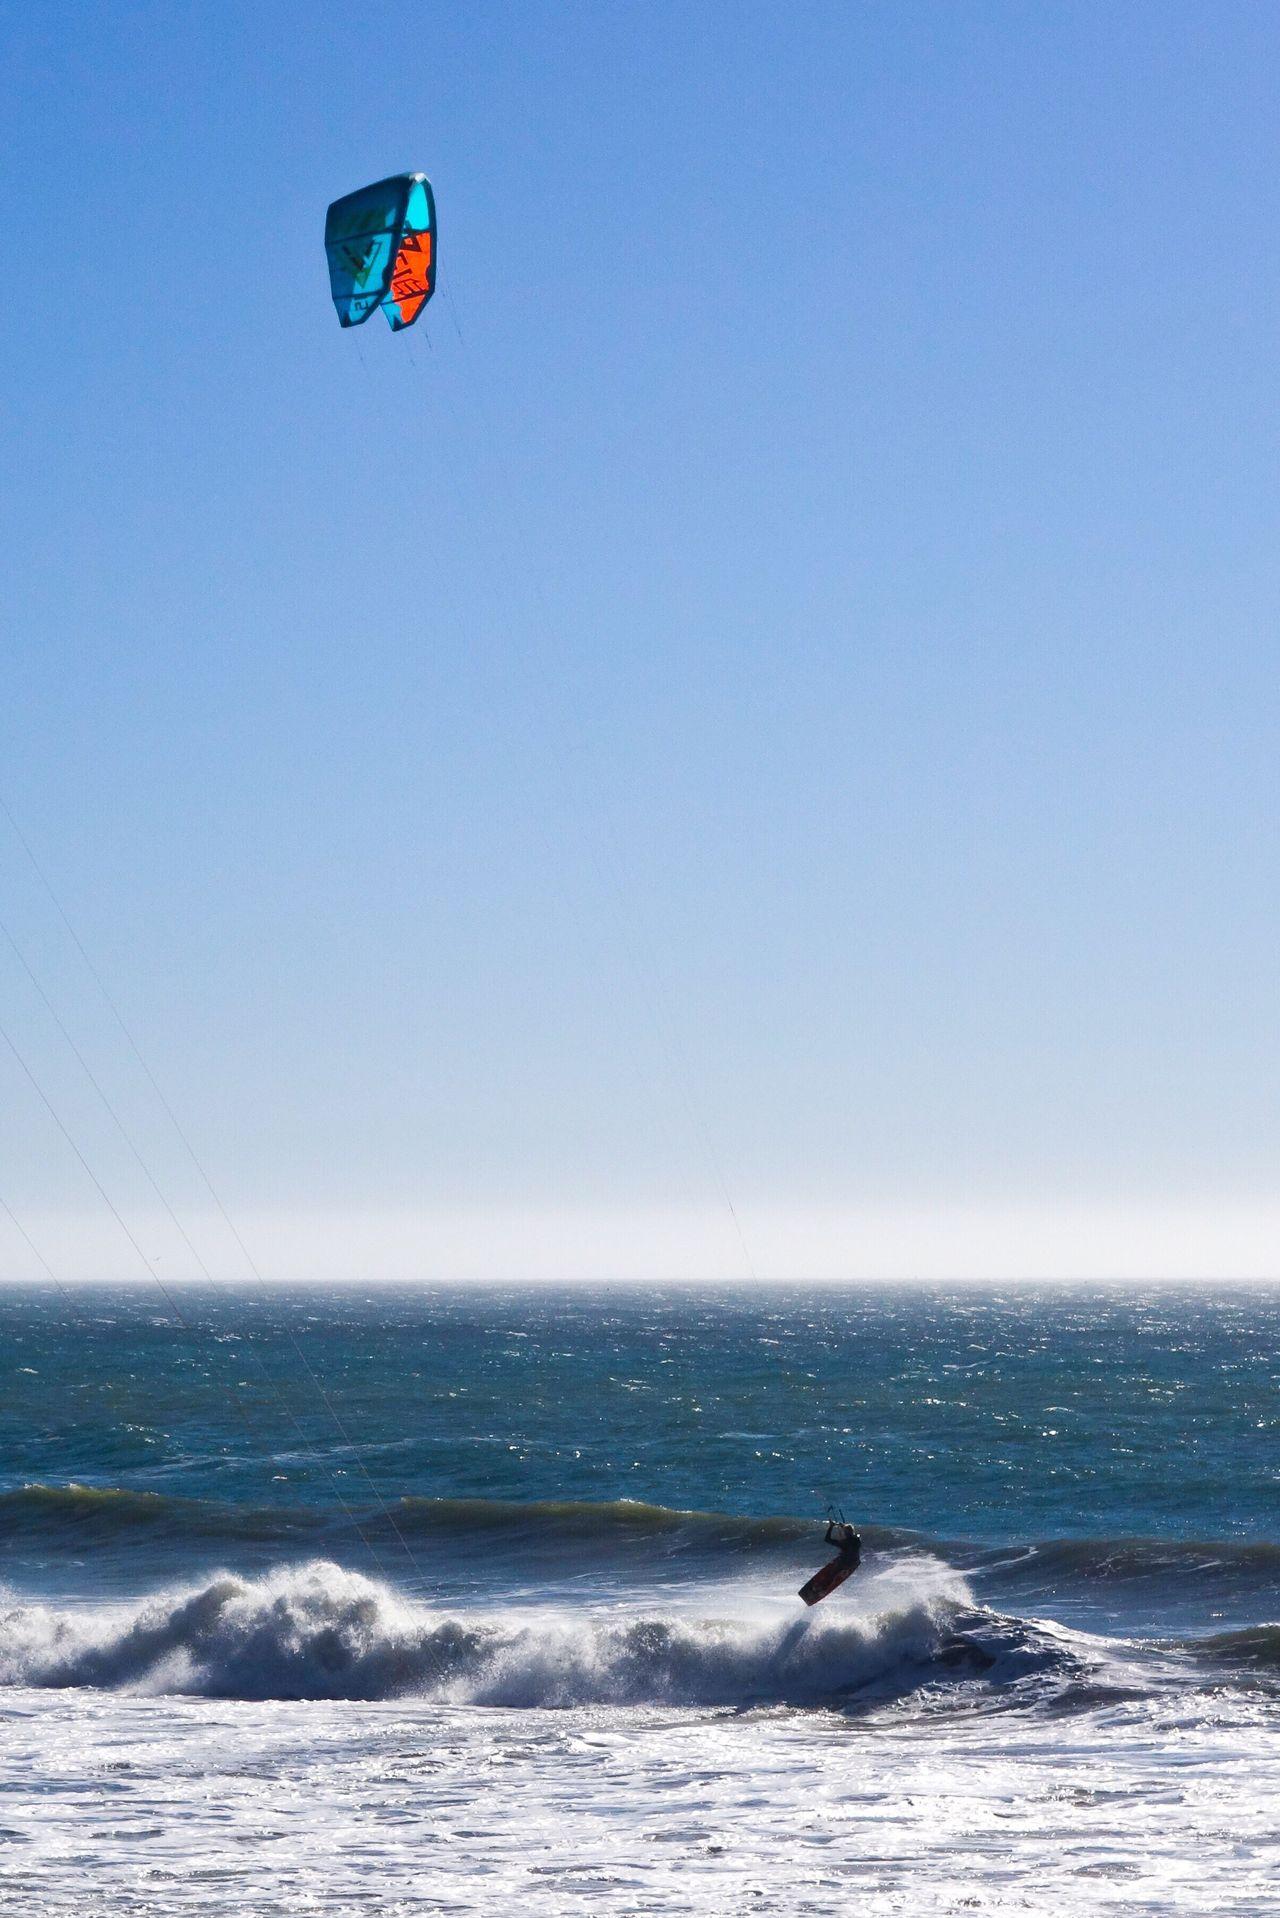 Waves Sea Adventure Water Extreme Sports Real People Sport Mid-air One Person Flying Scenics Lifestyles Santa Cruz California California Ocean Kitesurfing EyeEmNewHere Travel Pacific Wave Jumping Surfing Shore Wave Jumping The Great Outdoors - 2017 EyeEm Awards